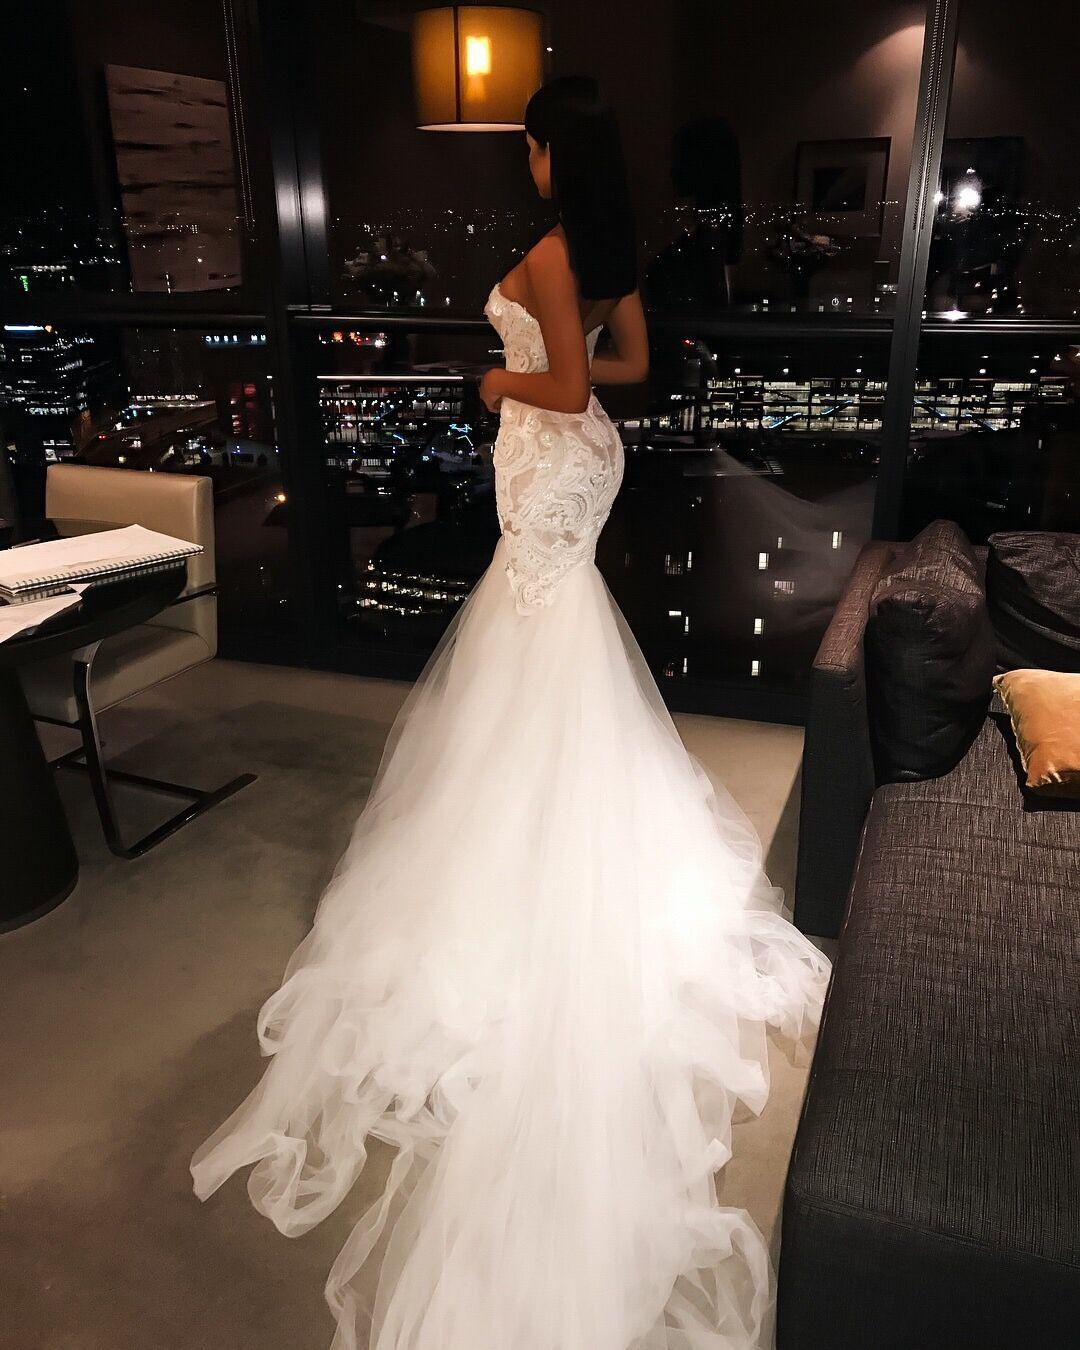 VinaKsena مجد | B E WED ! | Pinterest | Honey, Wedding dress and Wedding